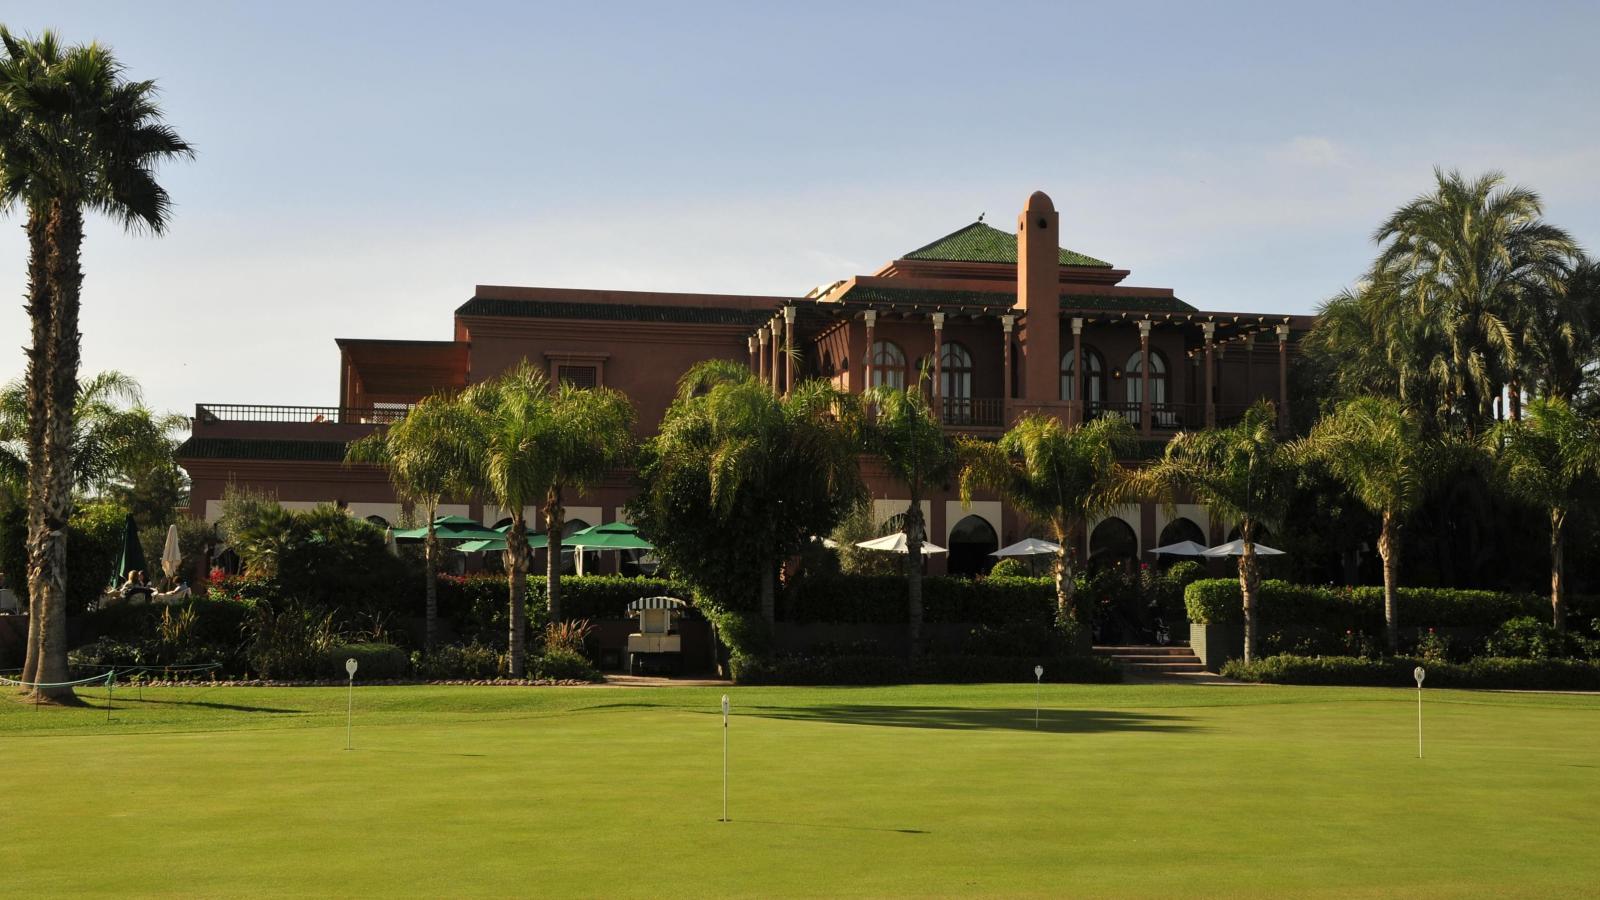 PalmGolf Marrakech Palmeraie ⛳️ Book Golf Online • golfscape™